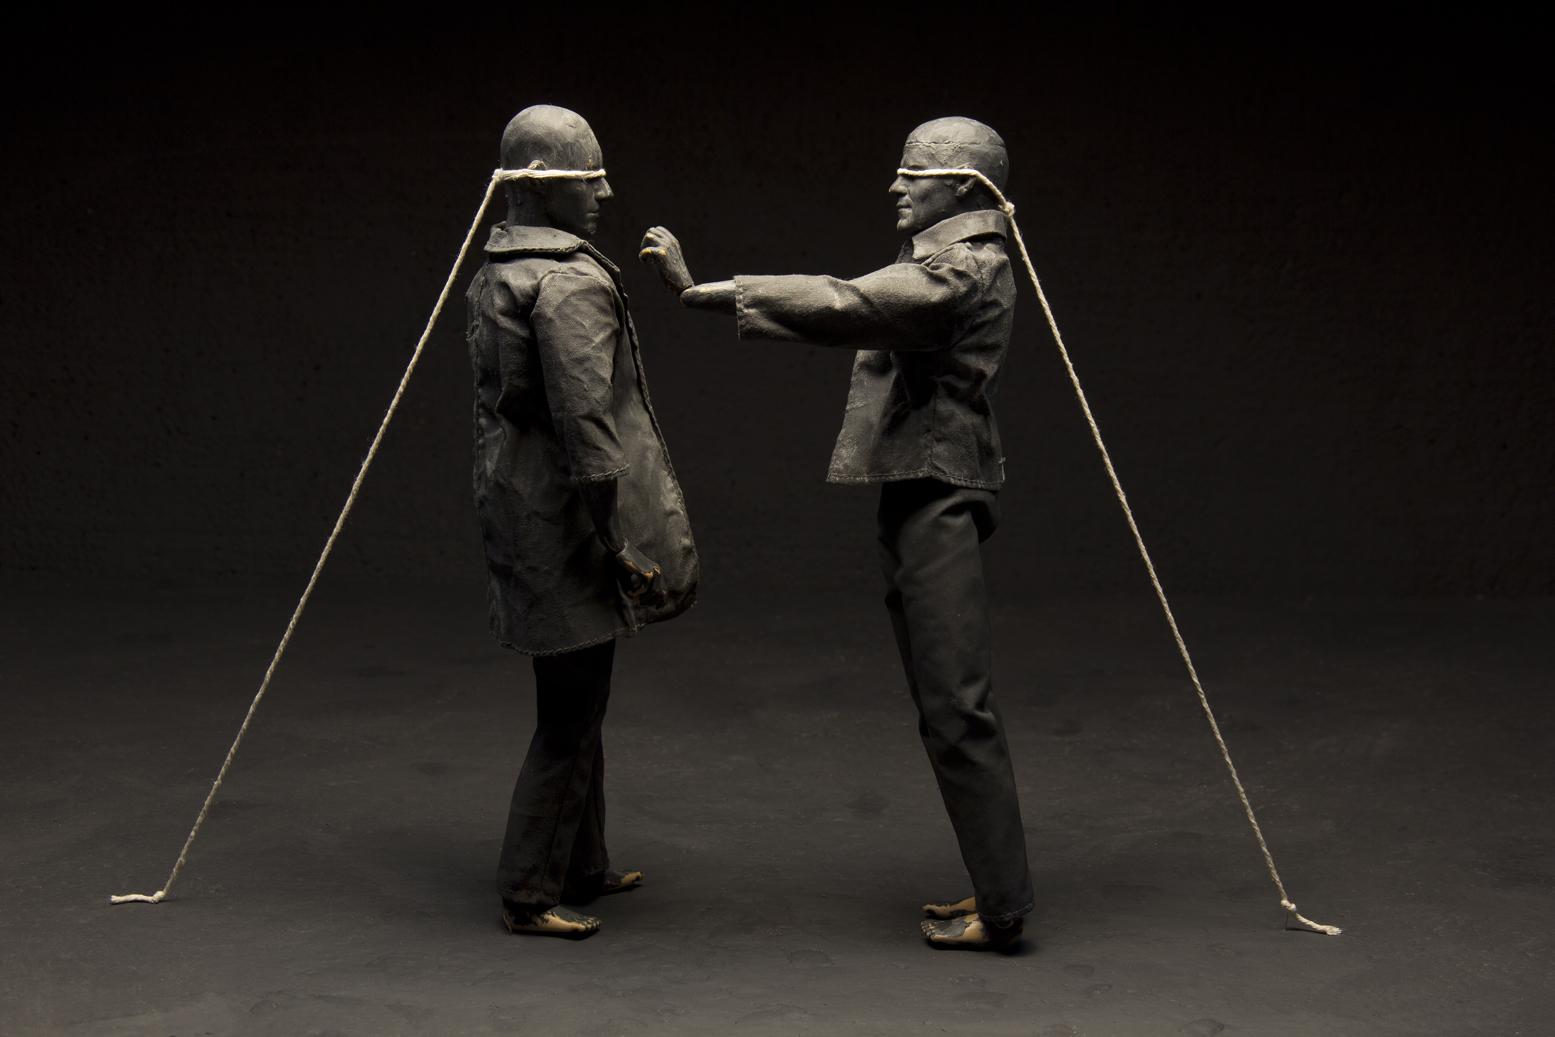 cayetano ferrandez @ minimal exposition